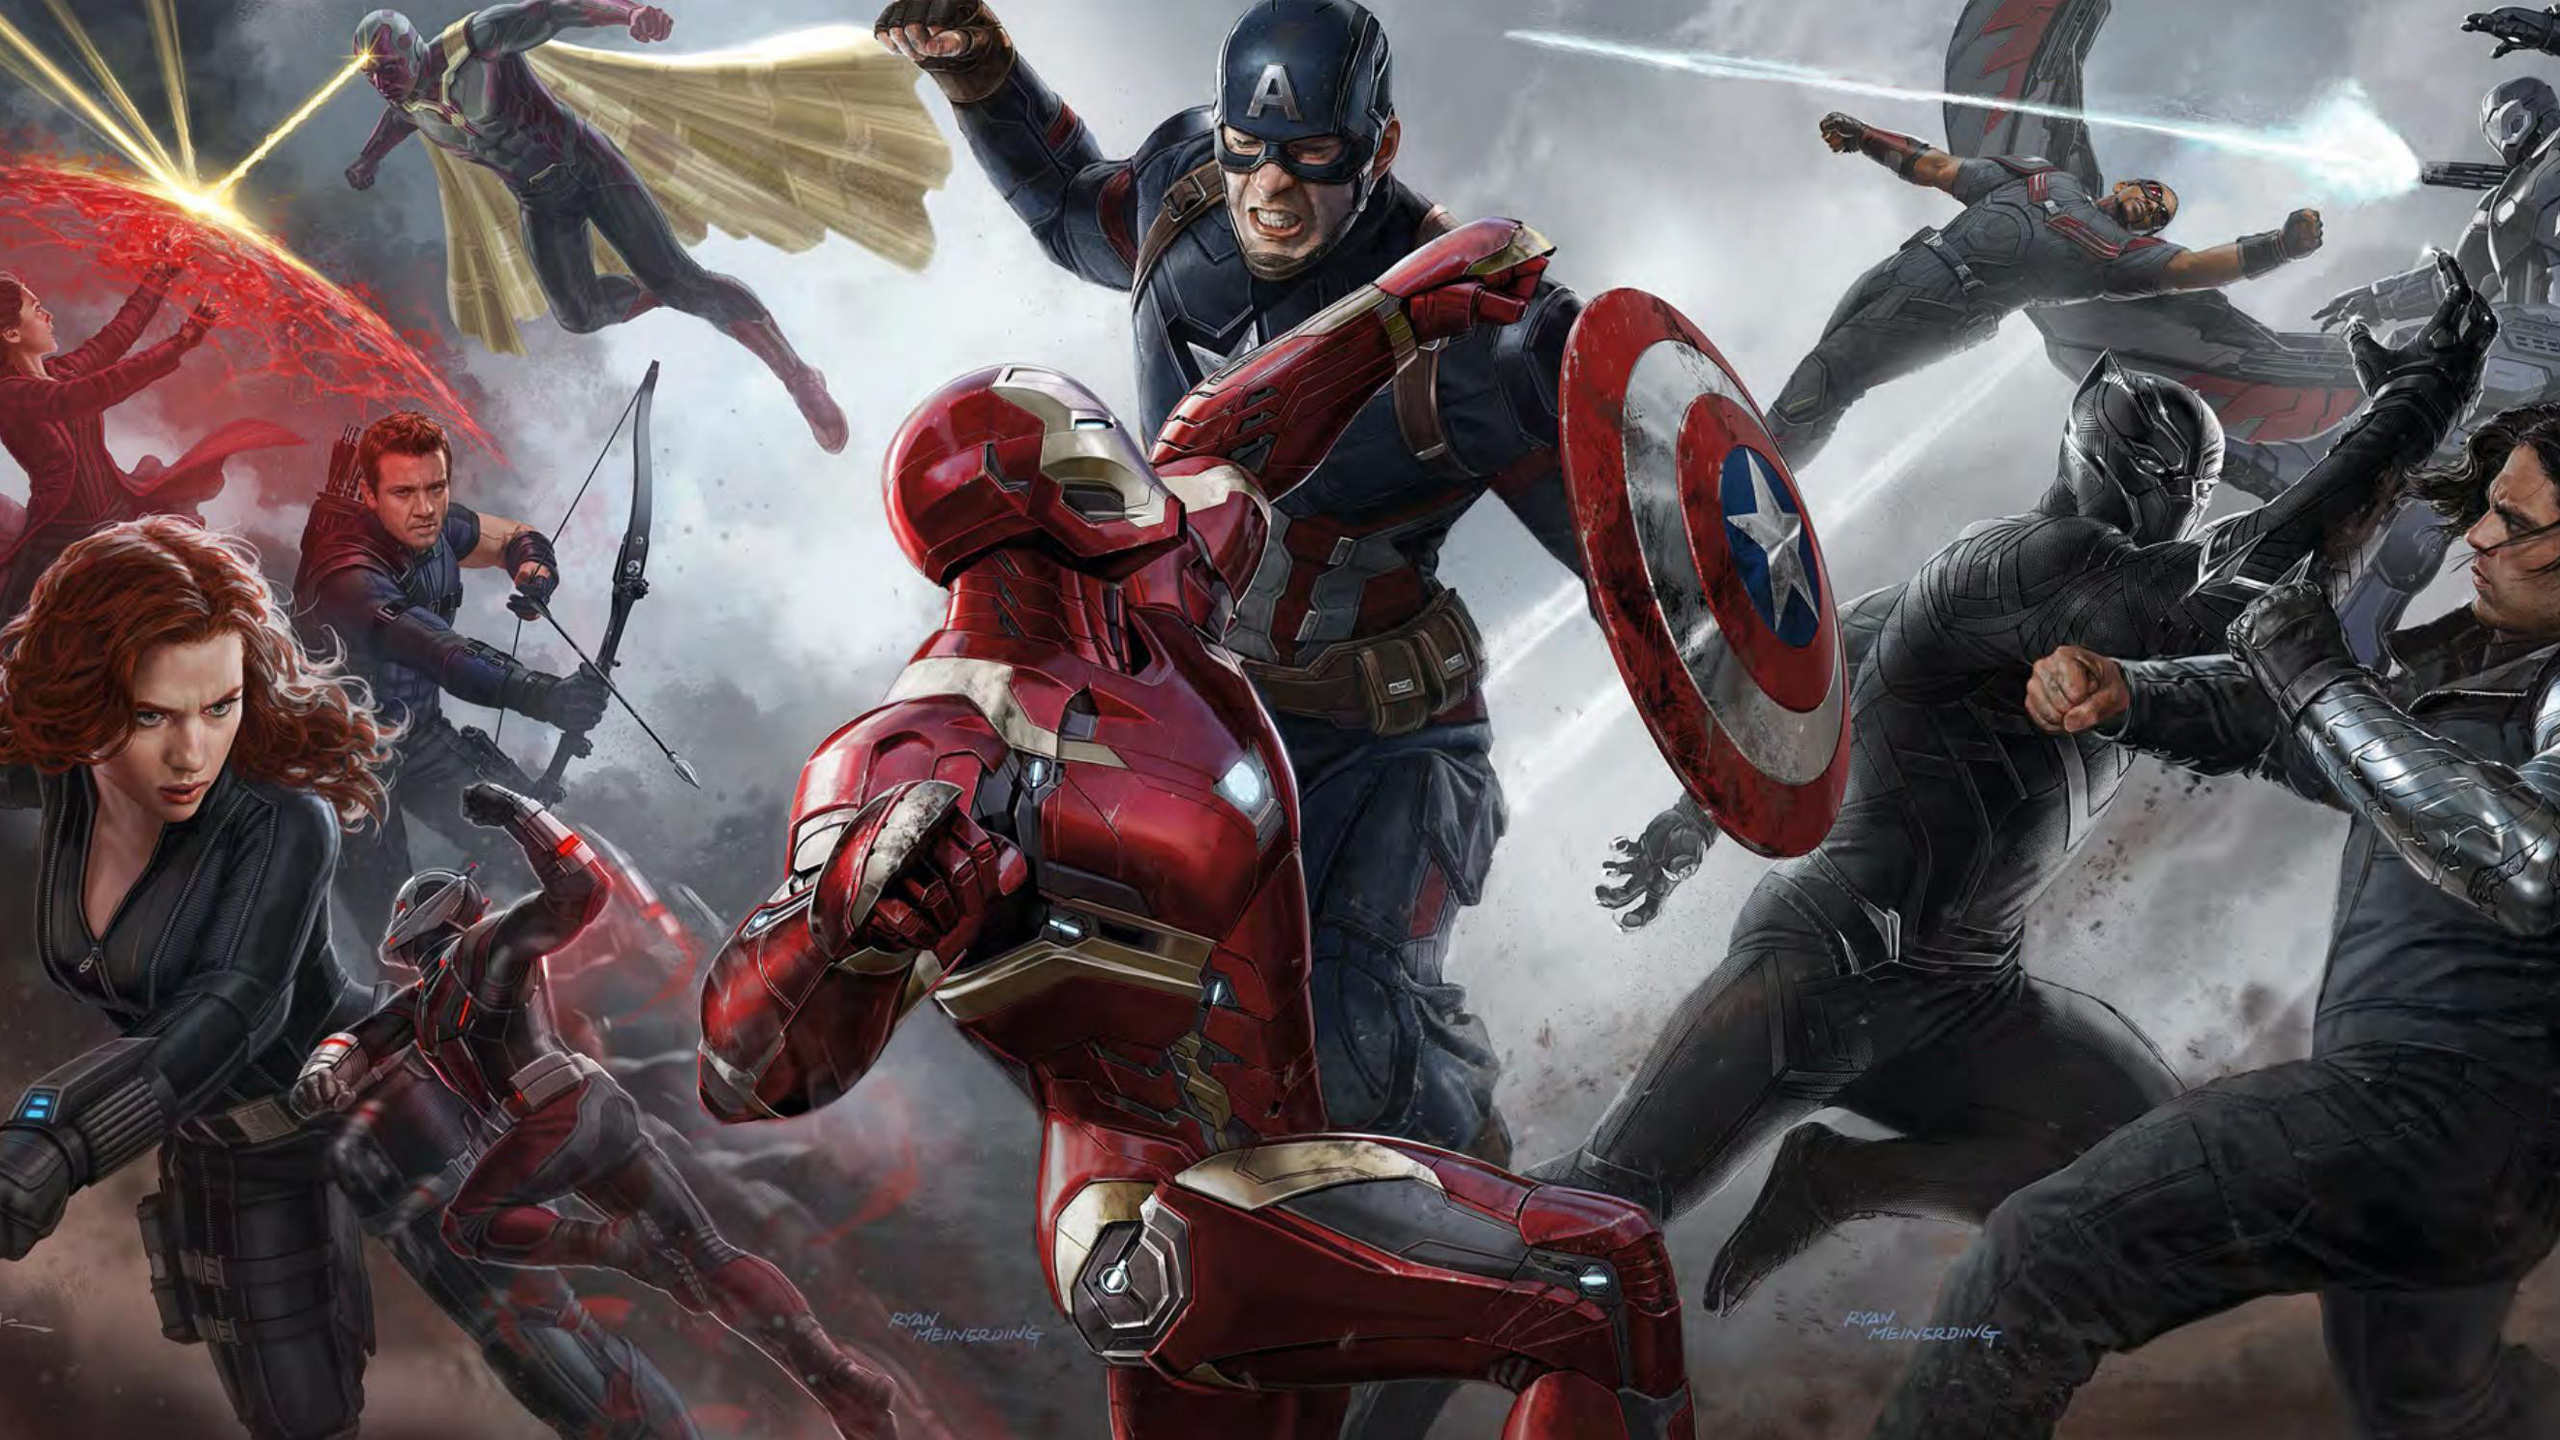 Captain America Civil War Concept Art Wallpapers | HD Wallpapers